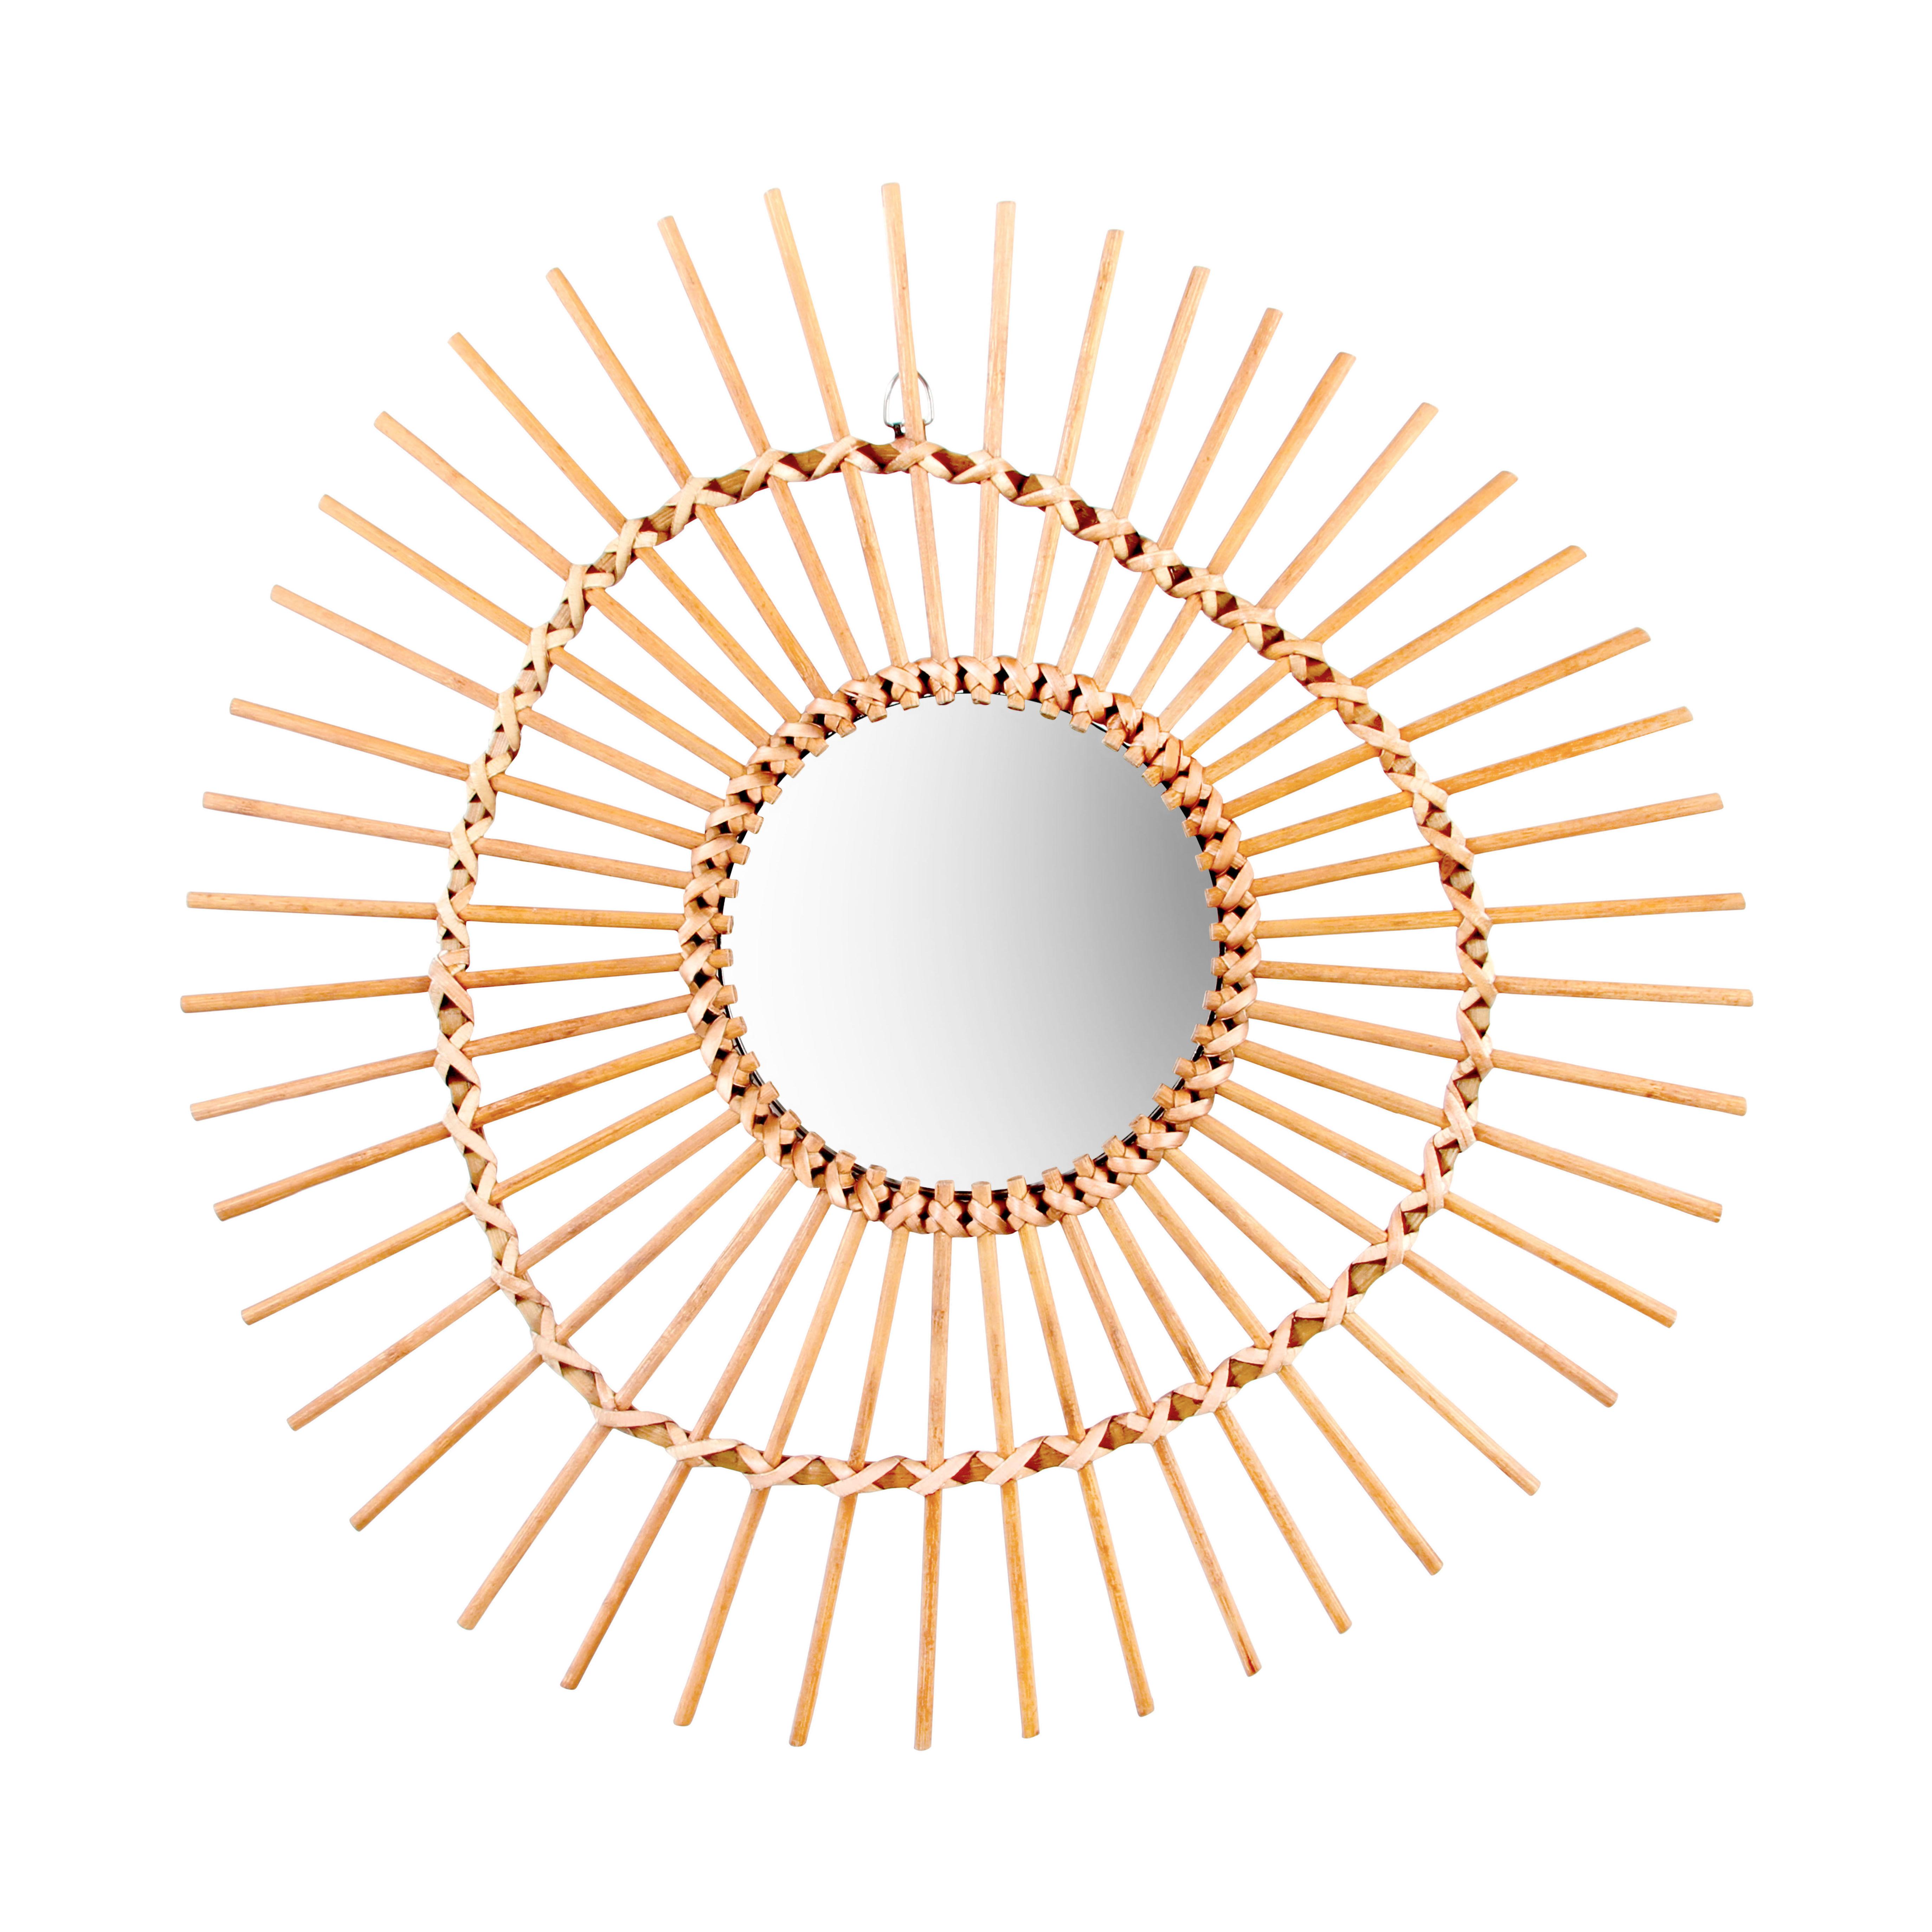 Interni - Specchi - Specchio Bamboo Irregular / Rattan - Ø 47 cm - & klevering - Irregolare / Naturale - Midollino, Vetro